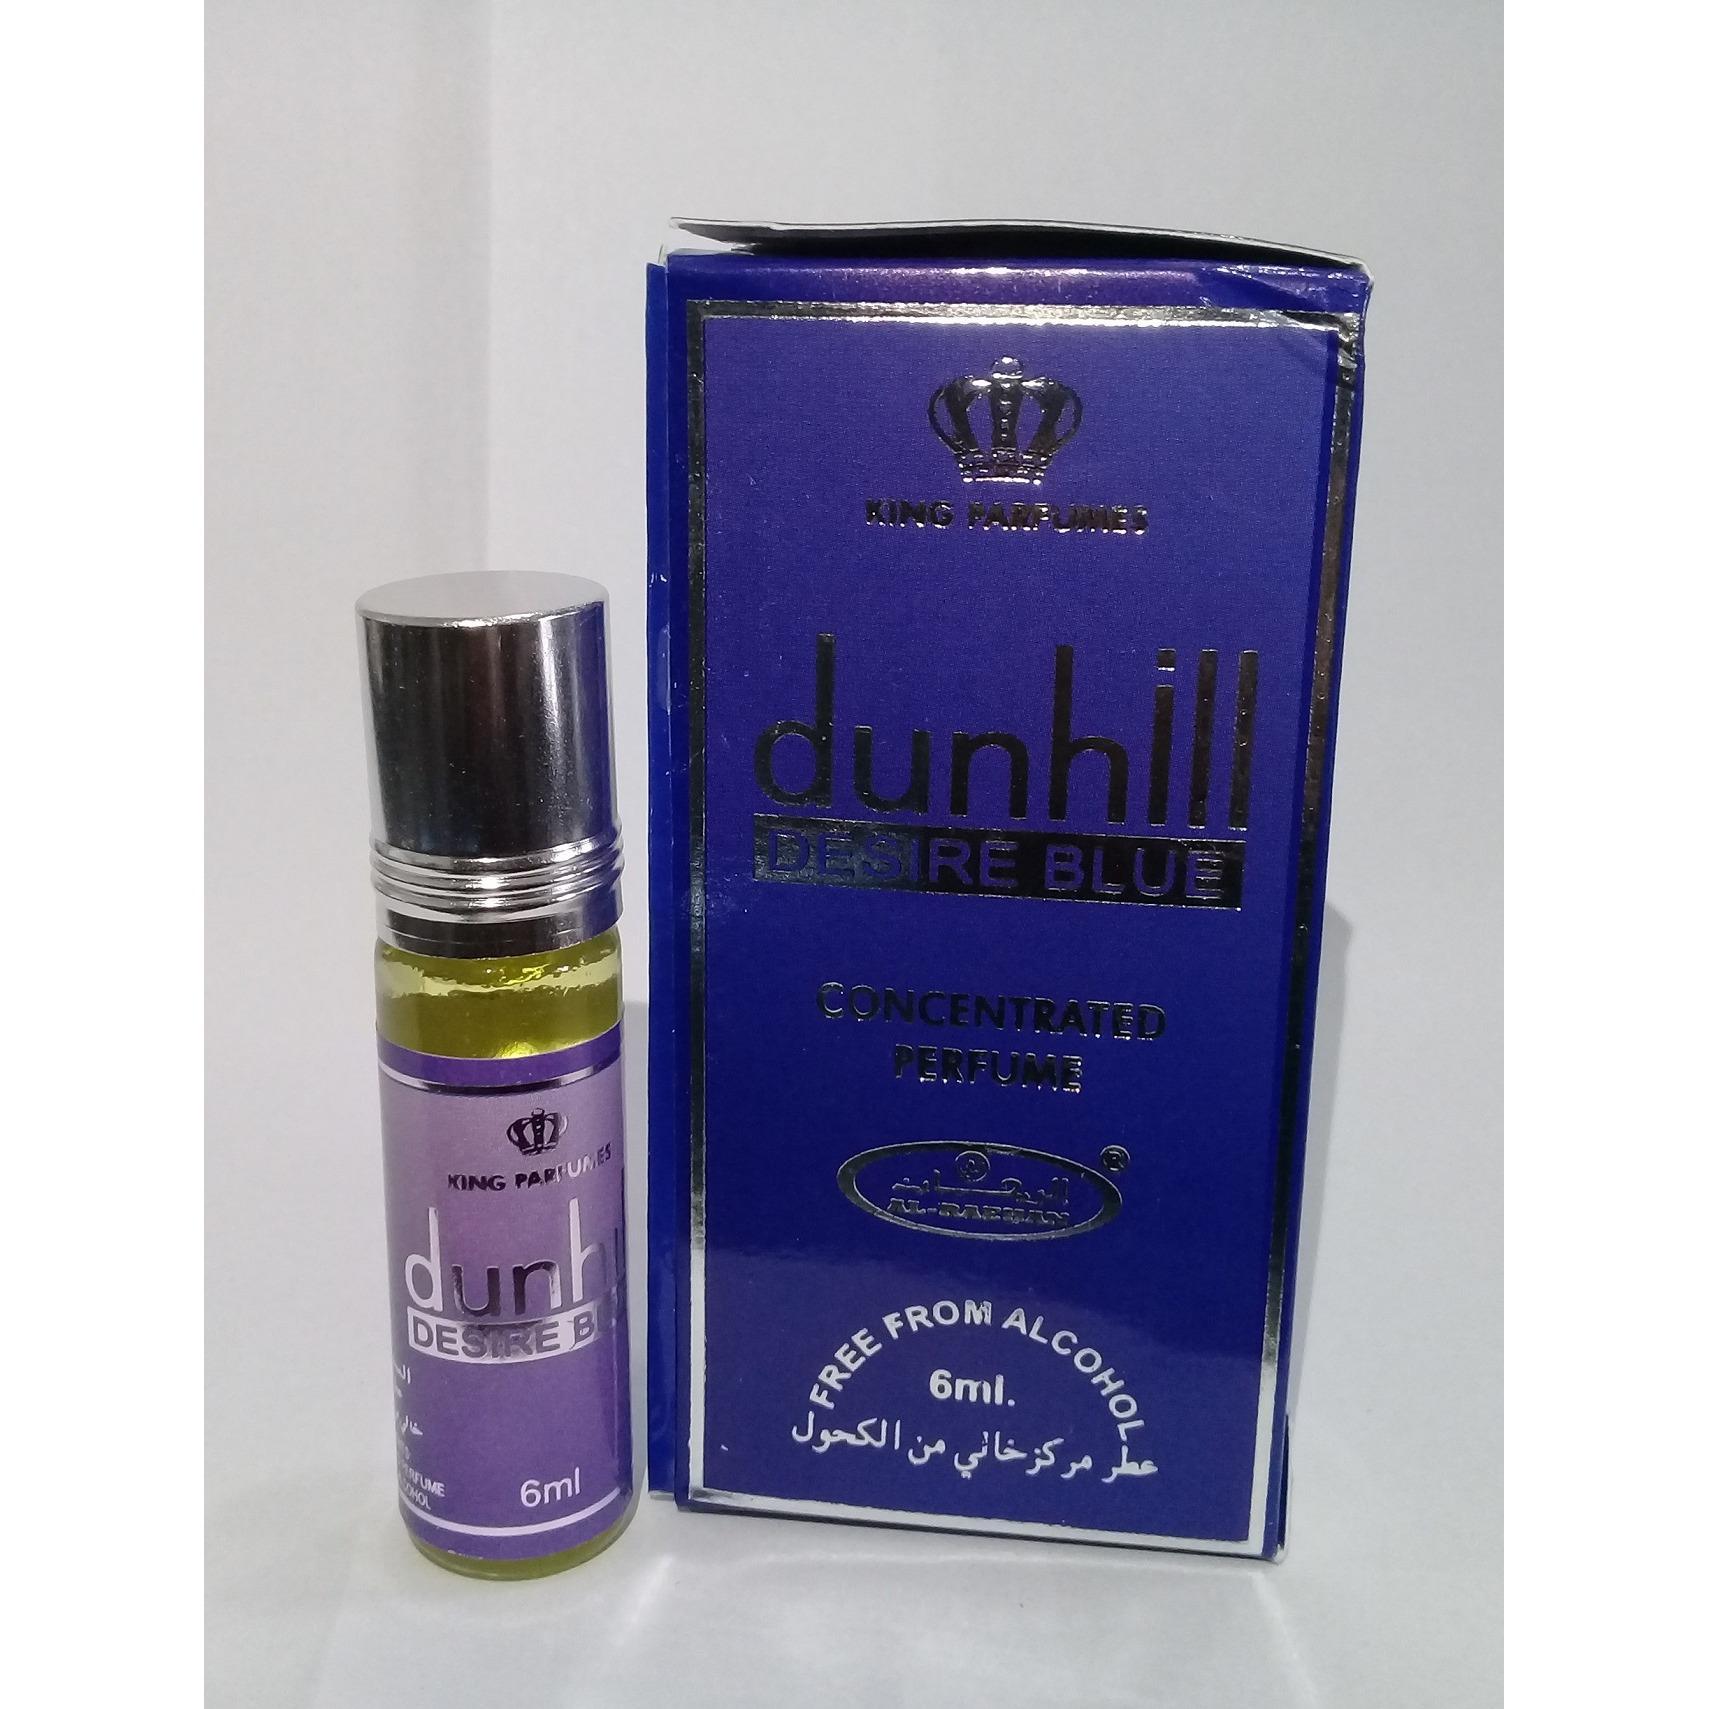 Parfume Roll On Al Raehan Dunhill Desire Blue 6ML - 2PCS